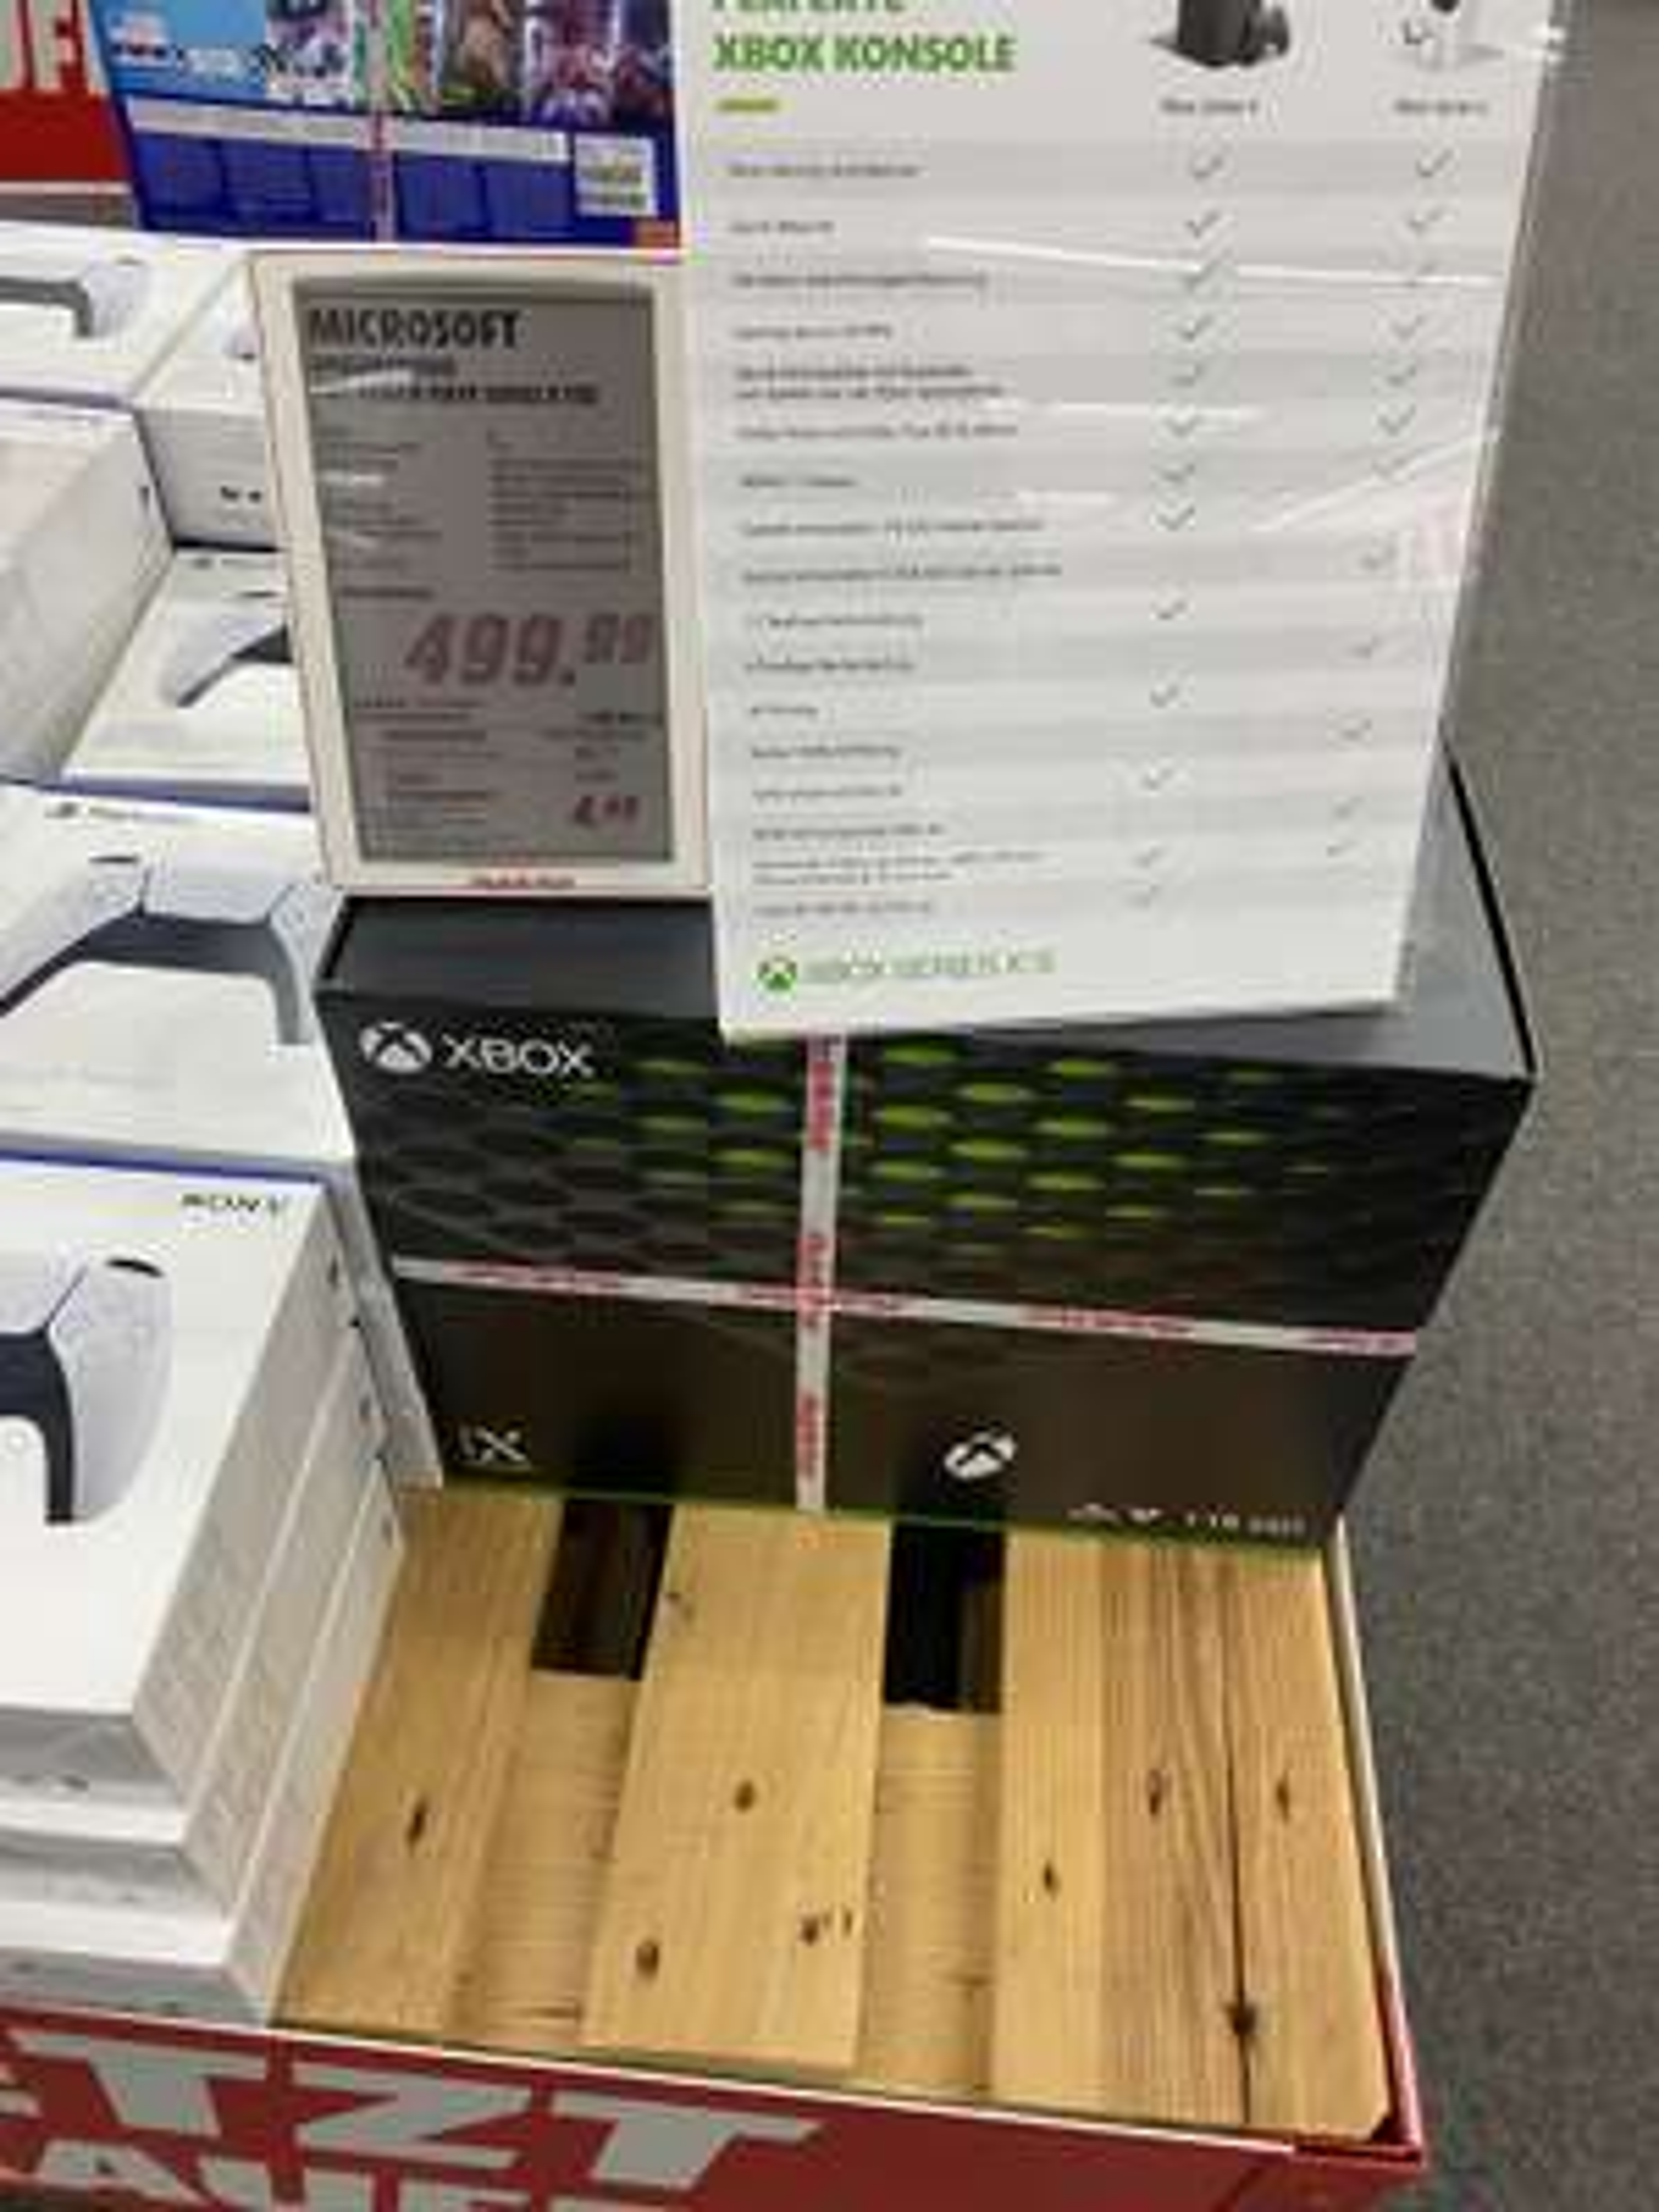 1x Xbox Series X - Lokal Media Mark Nördlingen